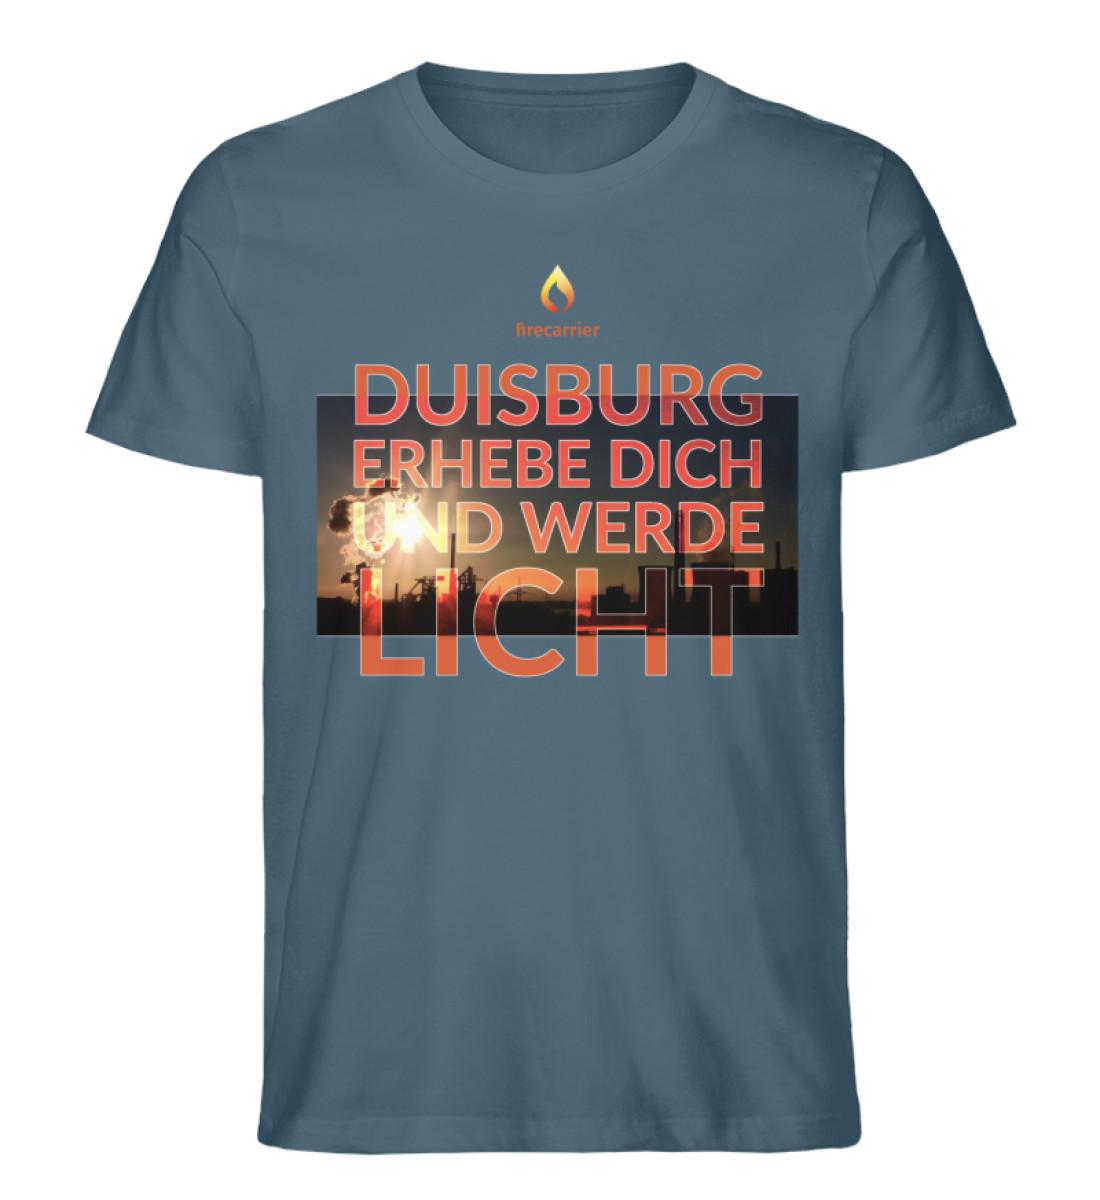 duisburg - Herren Premium Organic Shirt-6880